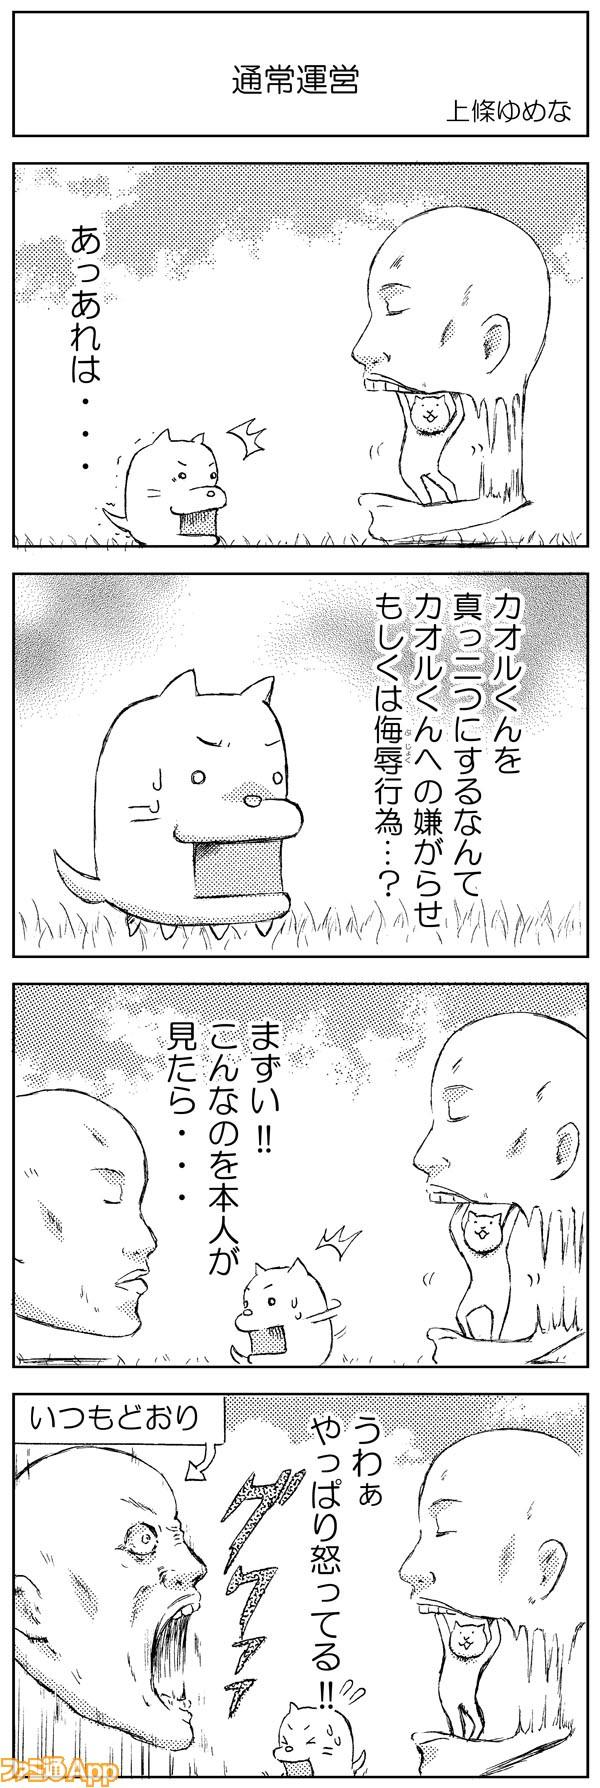 03kami_064